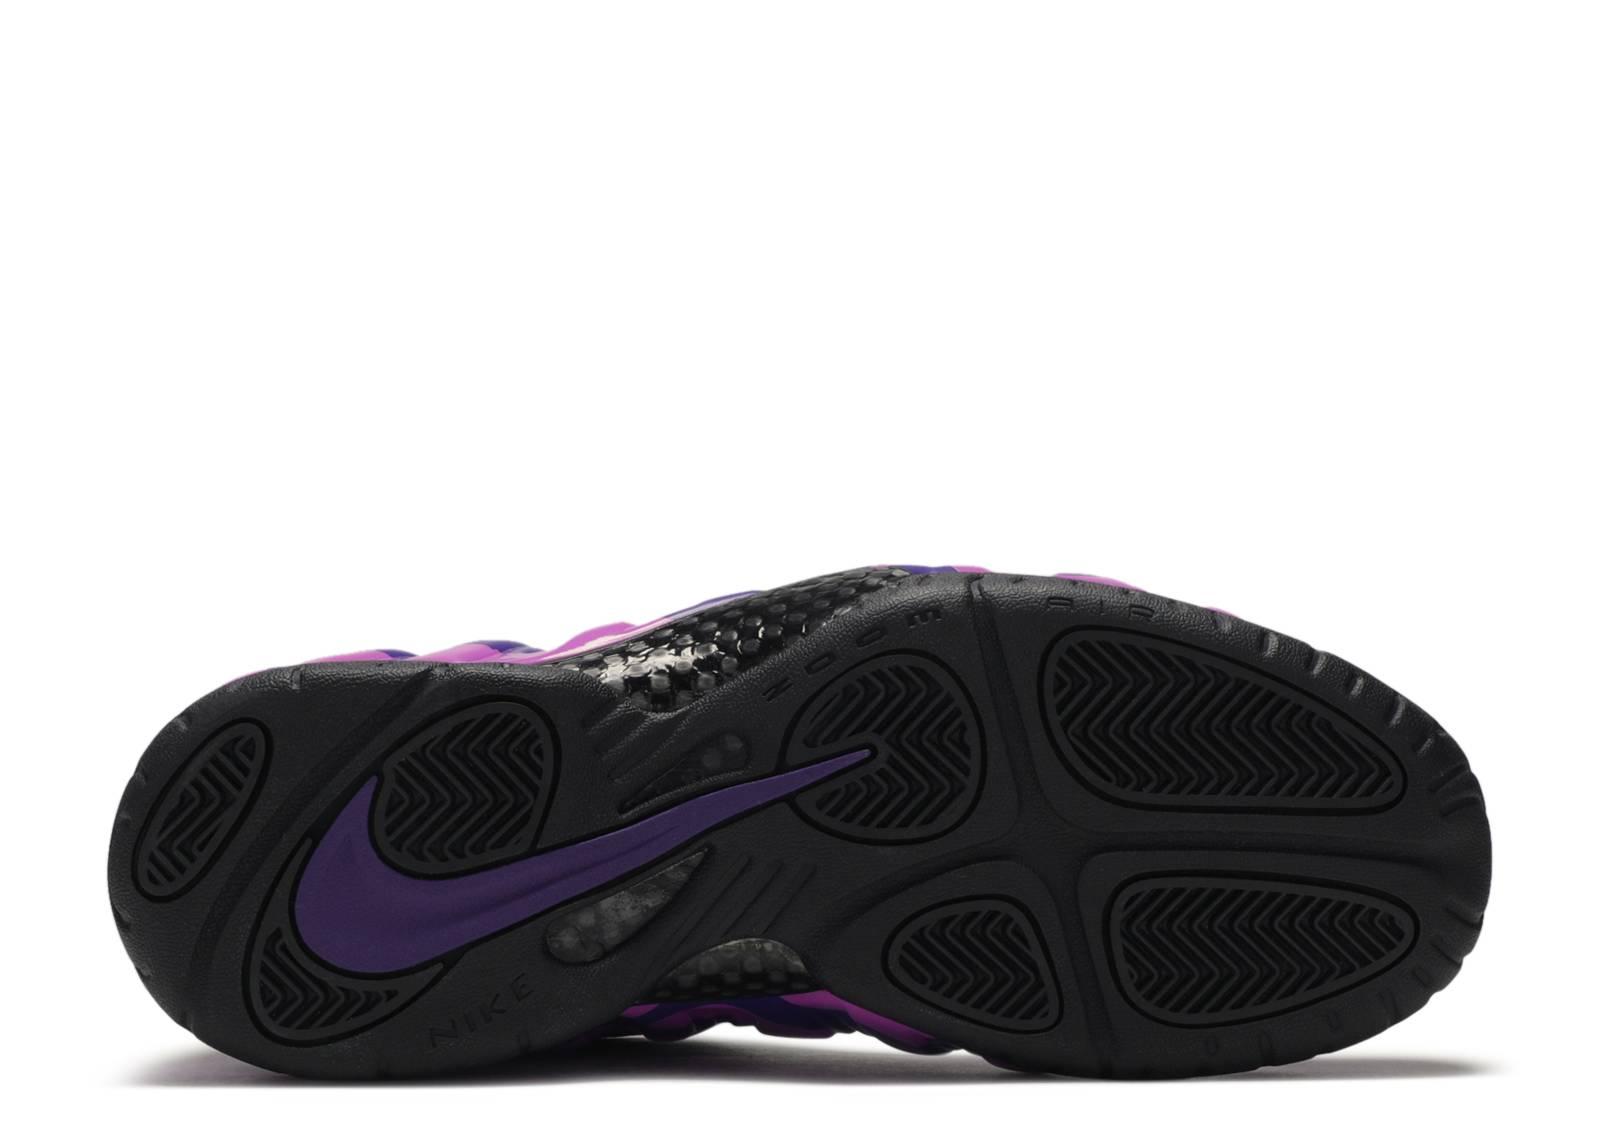 Nike Air Foamposite Pro Colorways Release Dates